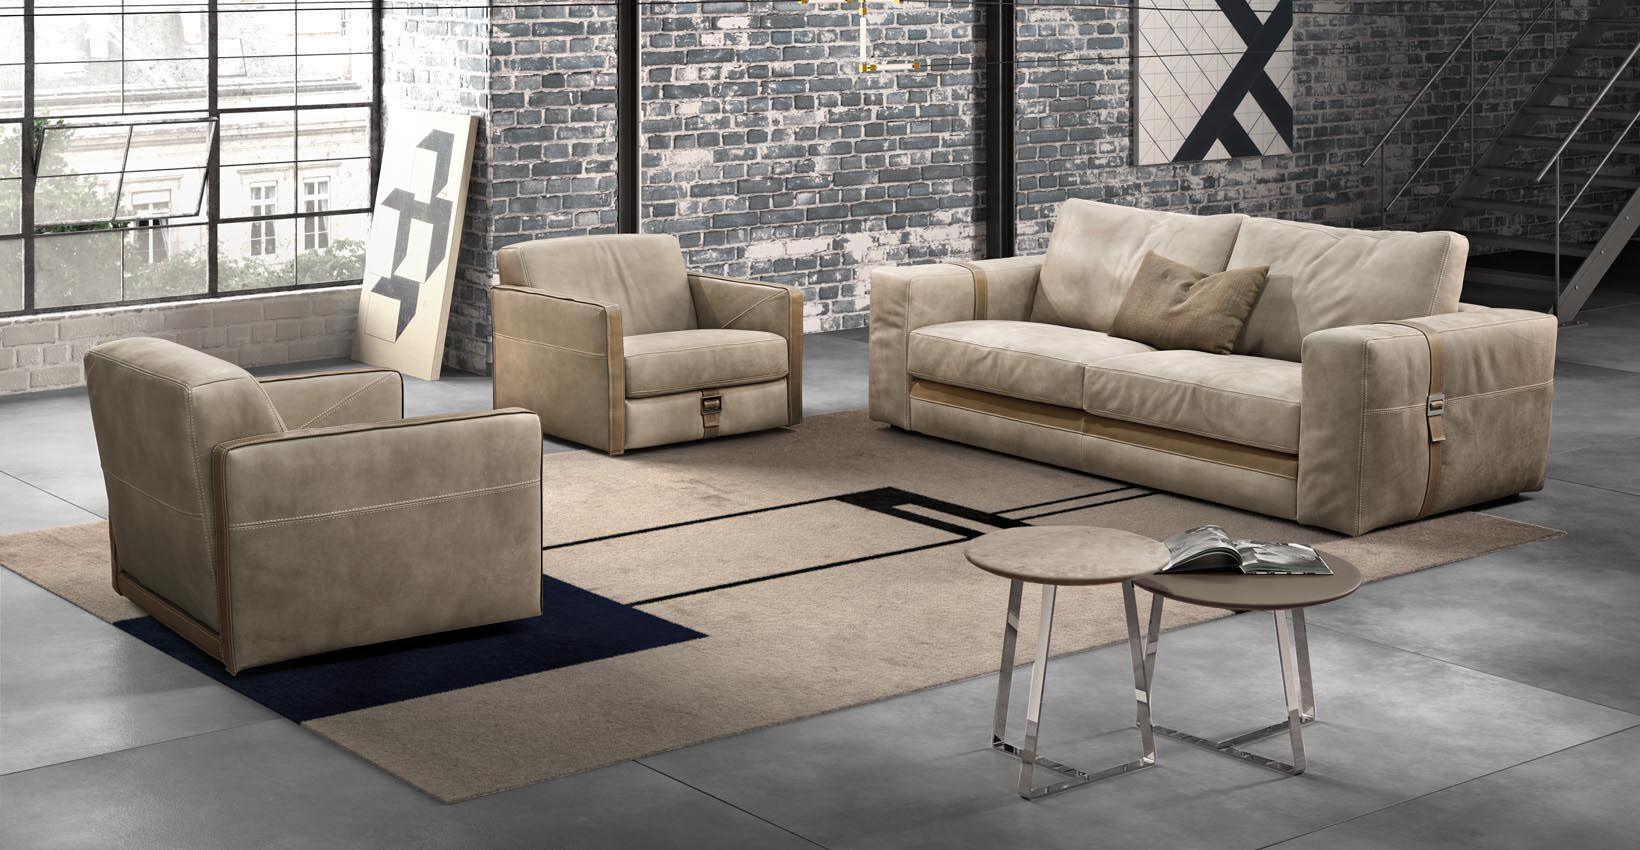 Contemporary Sofa Leather 2 Person Beige